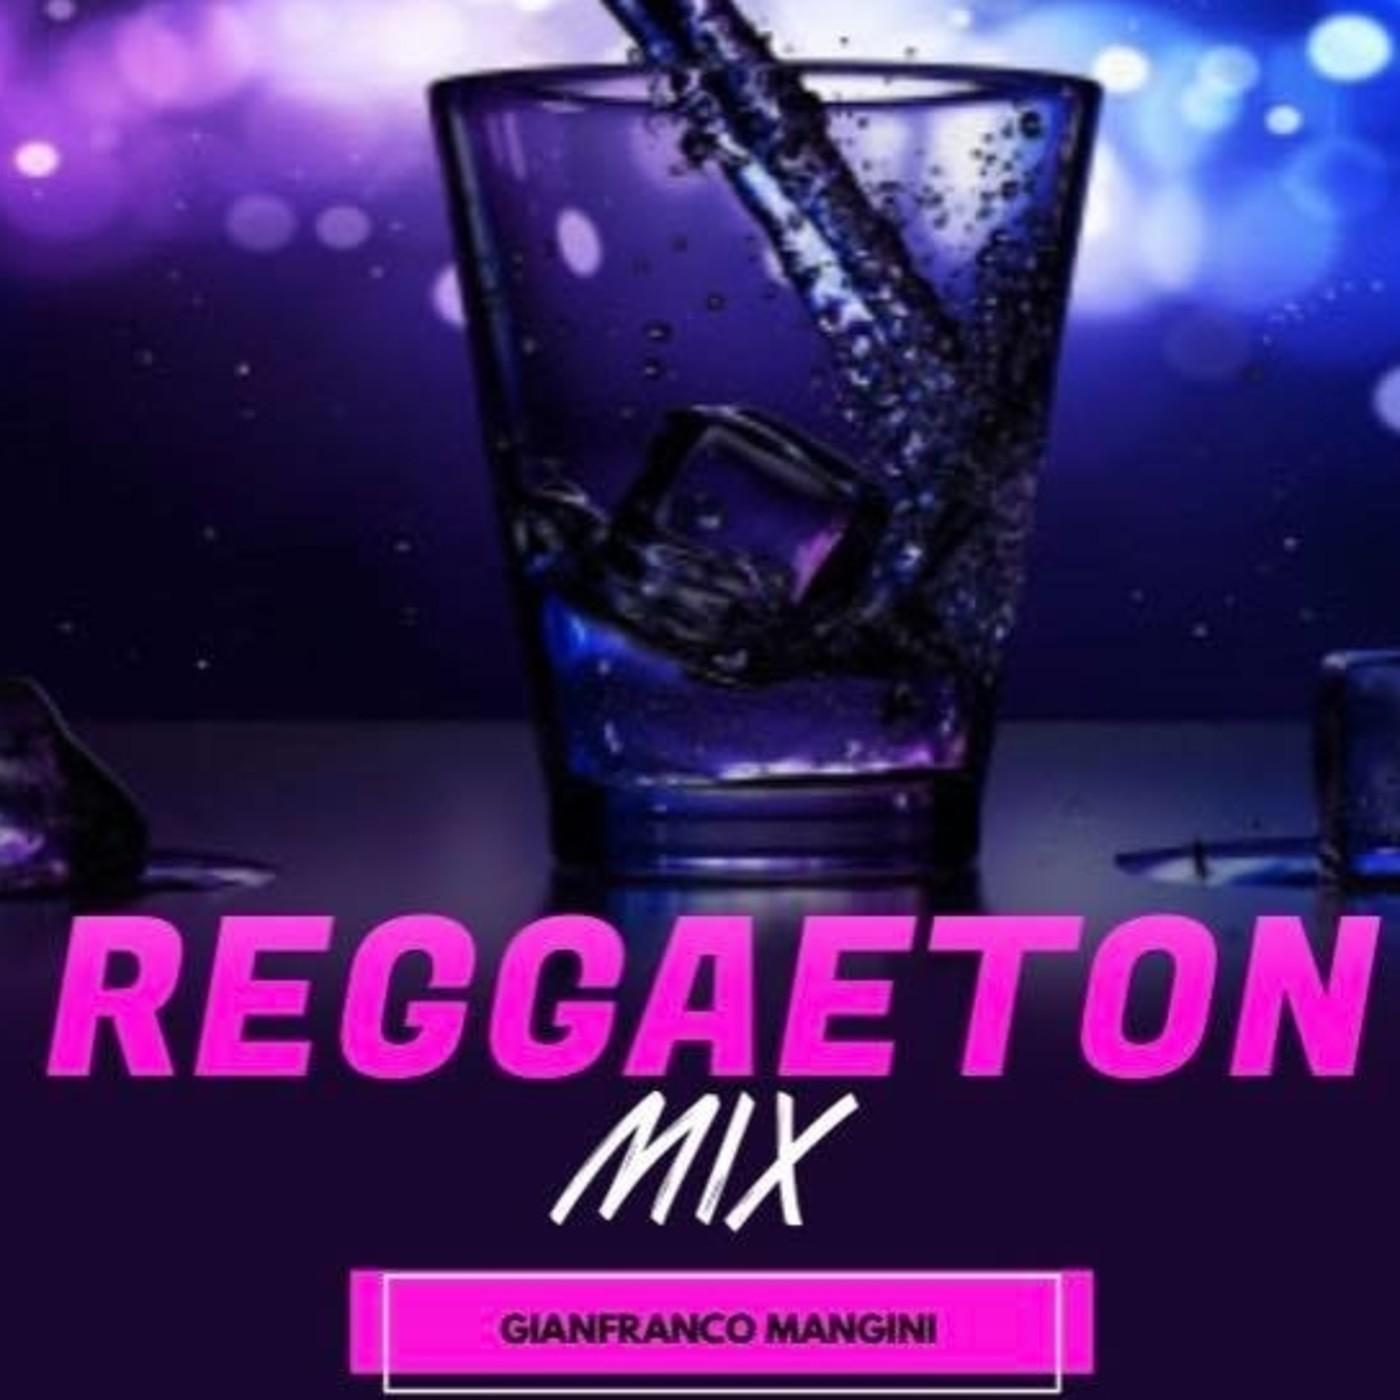 Reggaeton en cuarentena ep. IV